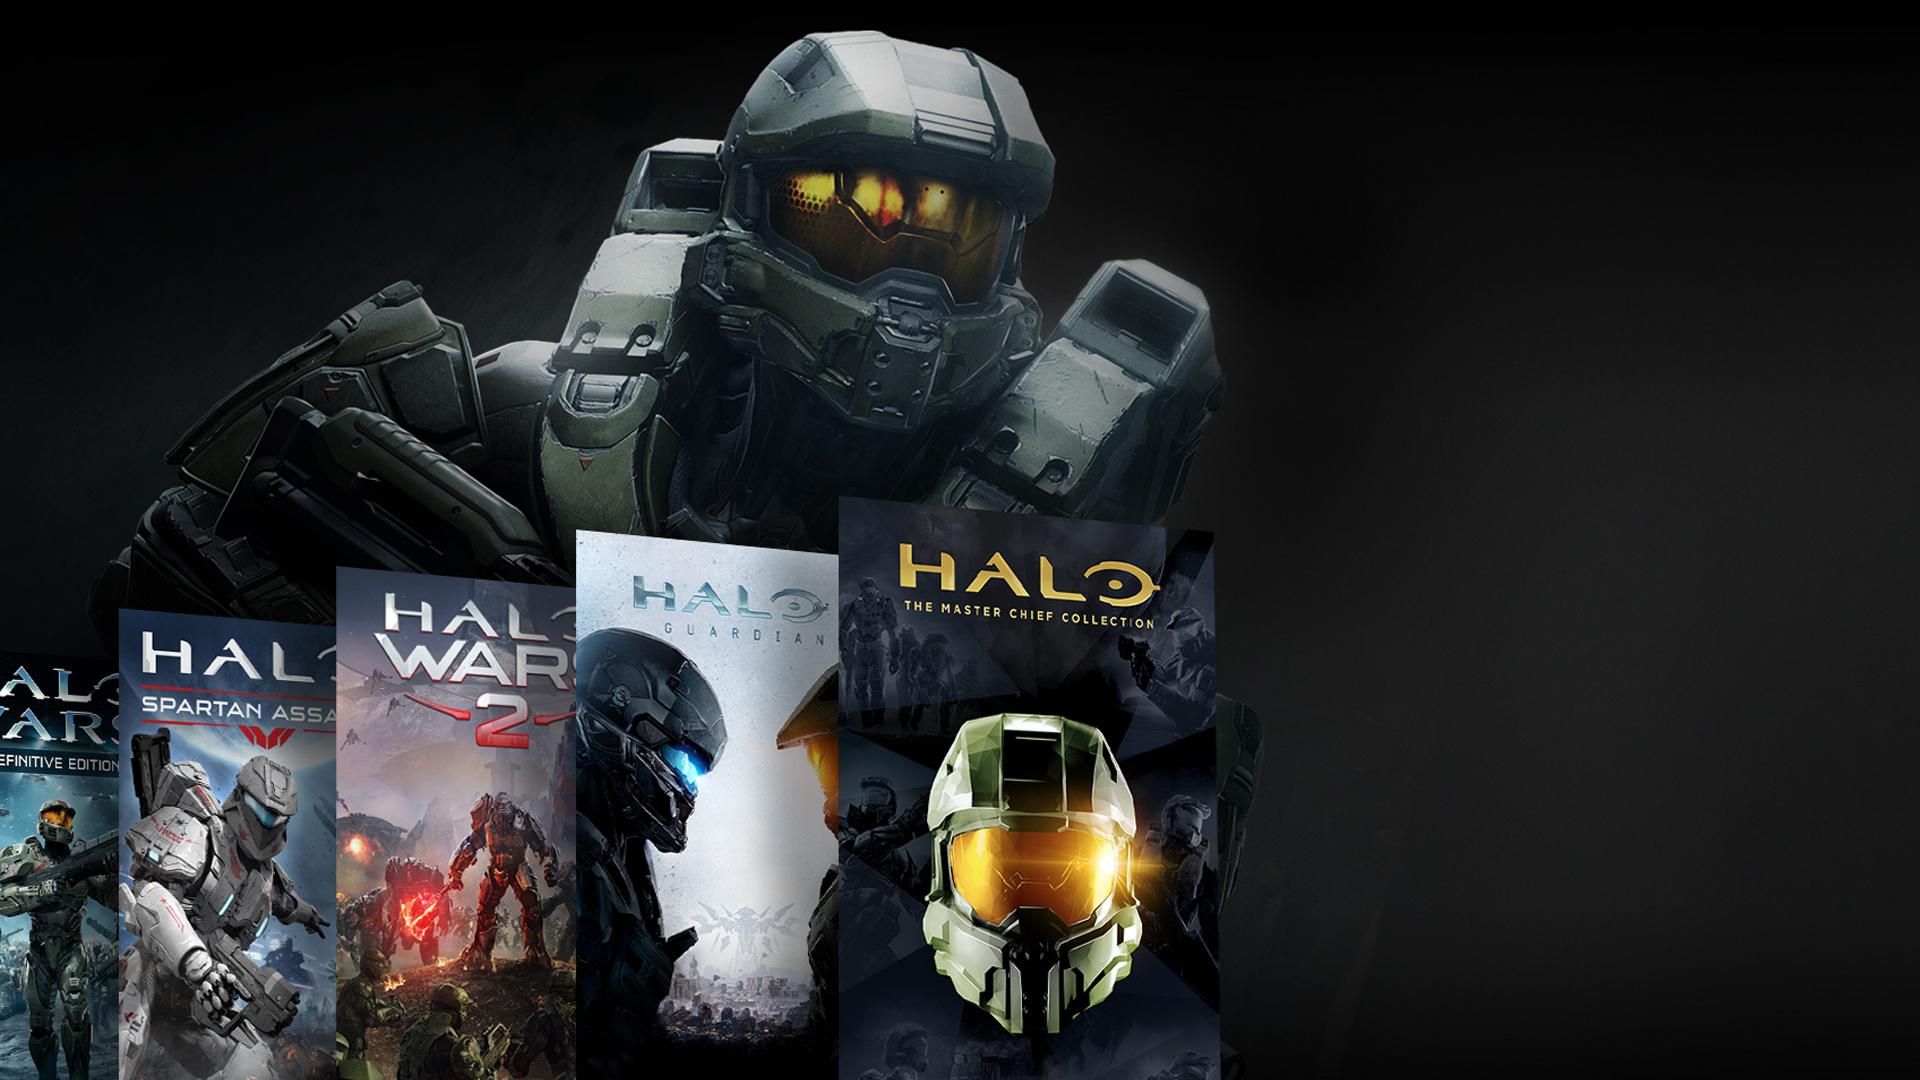 Halo games.